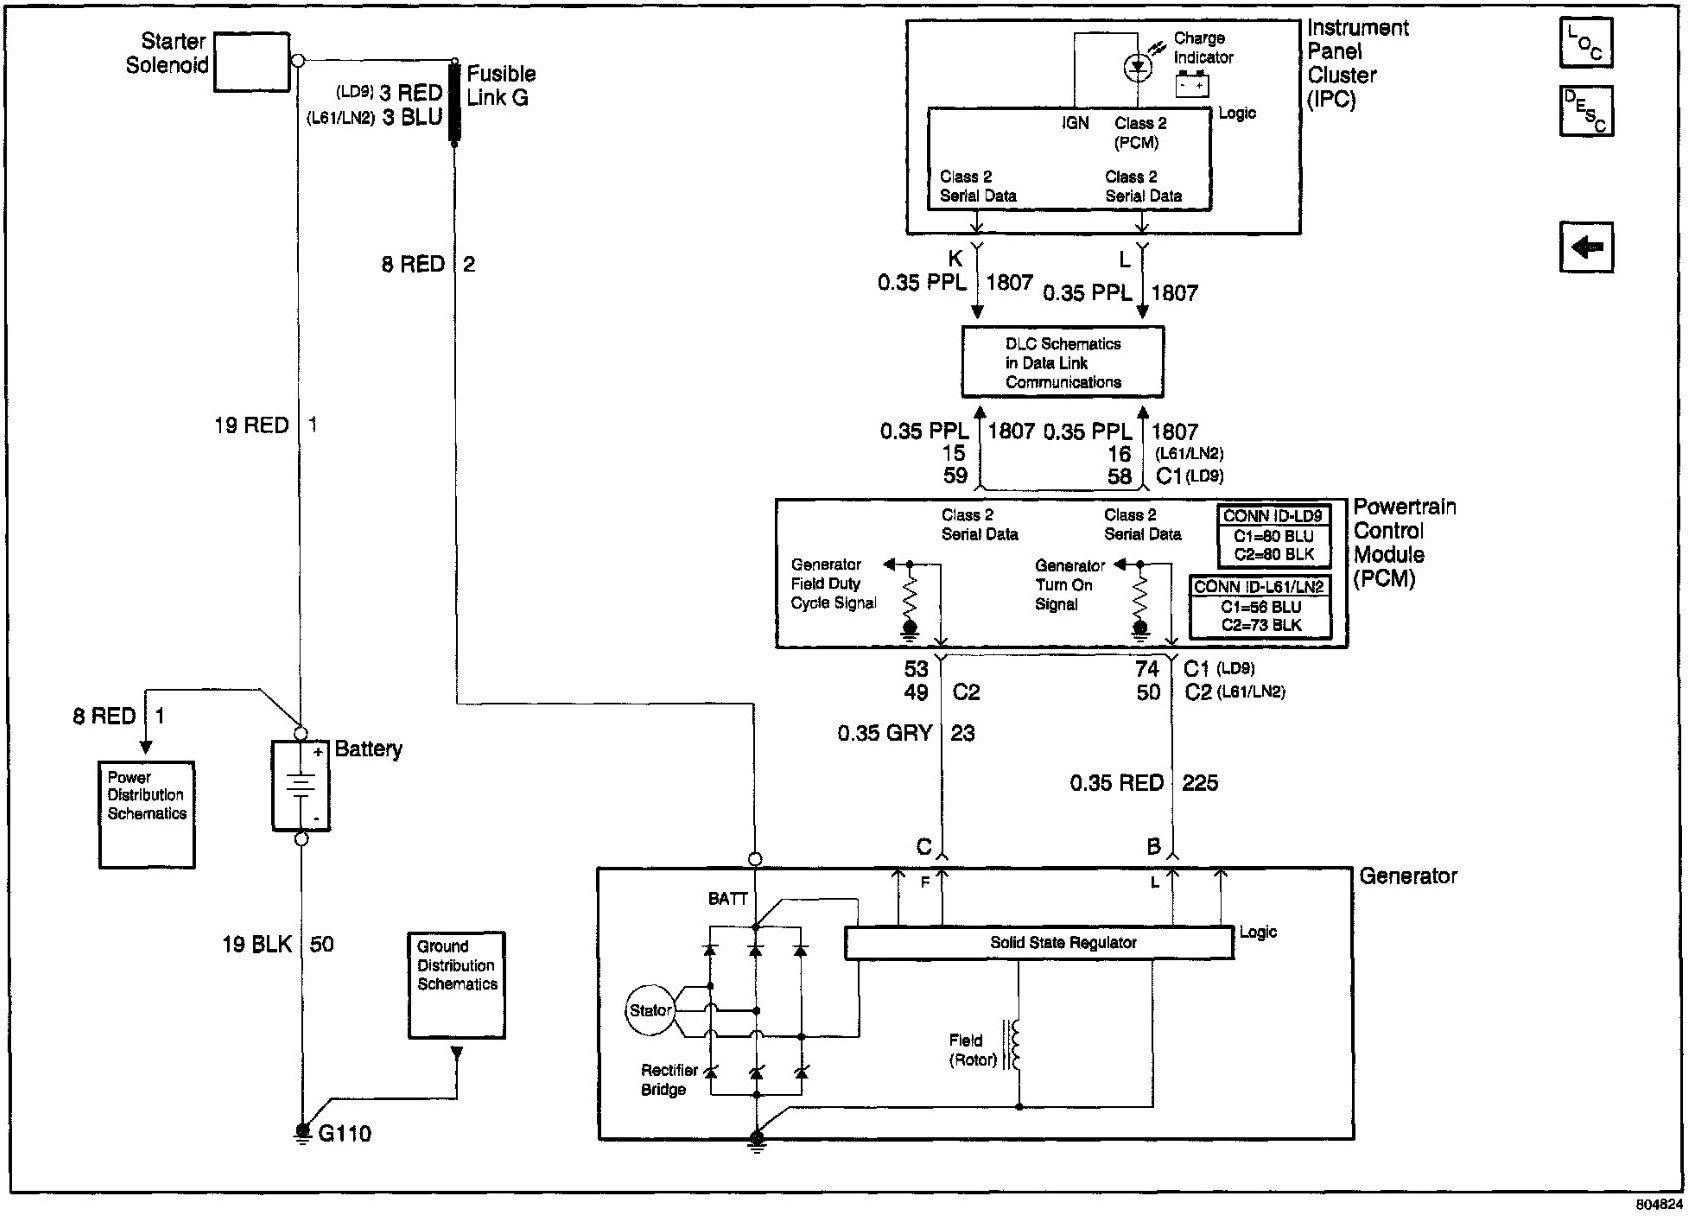 Grafik 1997 Chevrolet Cavalier Wiring Diagram Full Hd Tabletodiagram Bruxelles Enscene Be